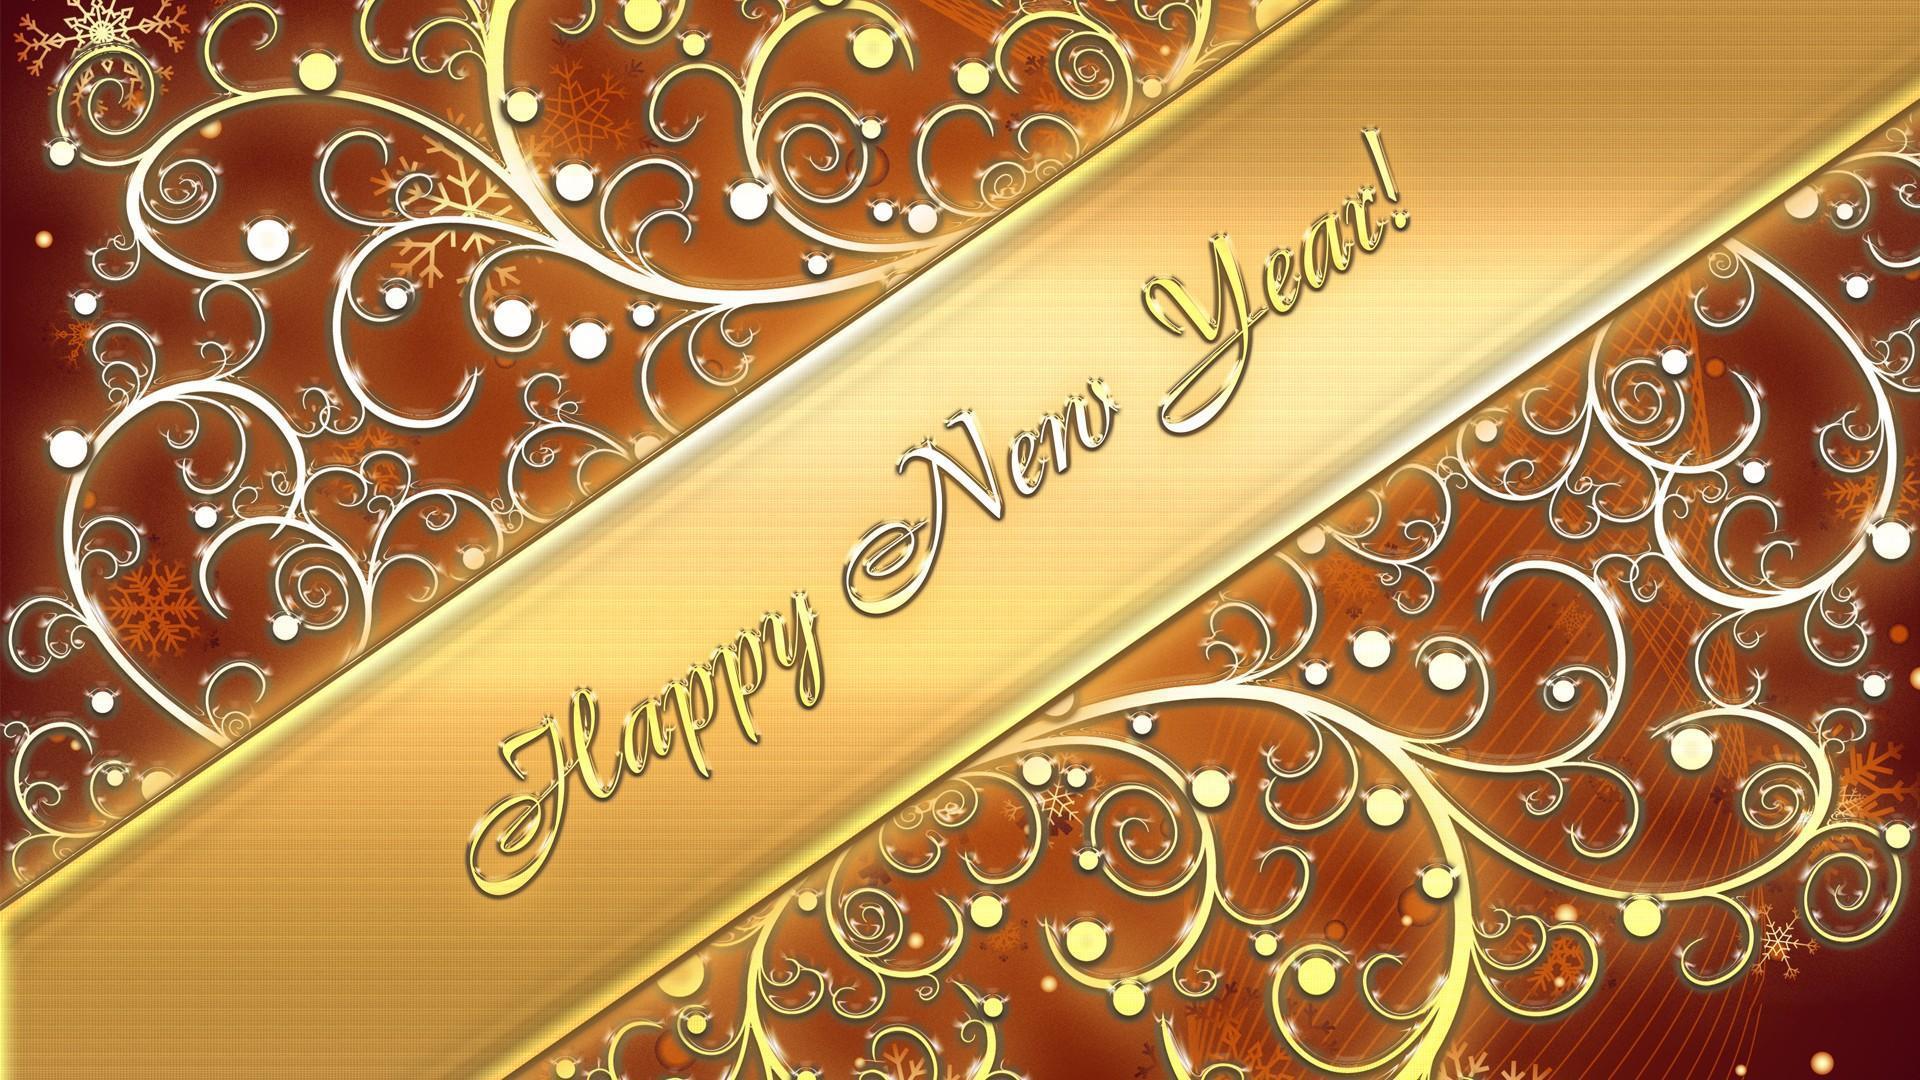 happy new year wishes greetings hd pc desktop wallpaper